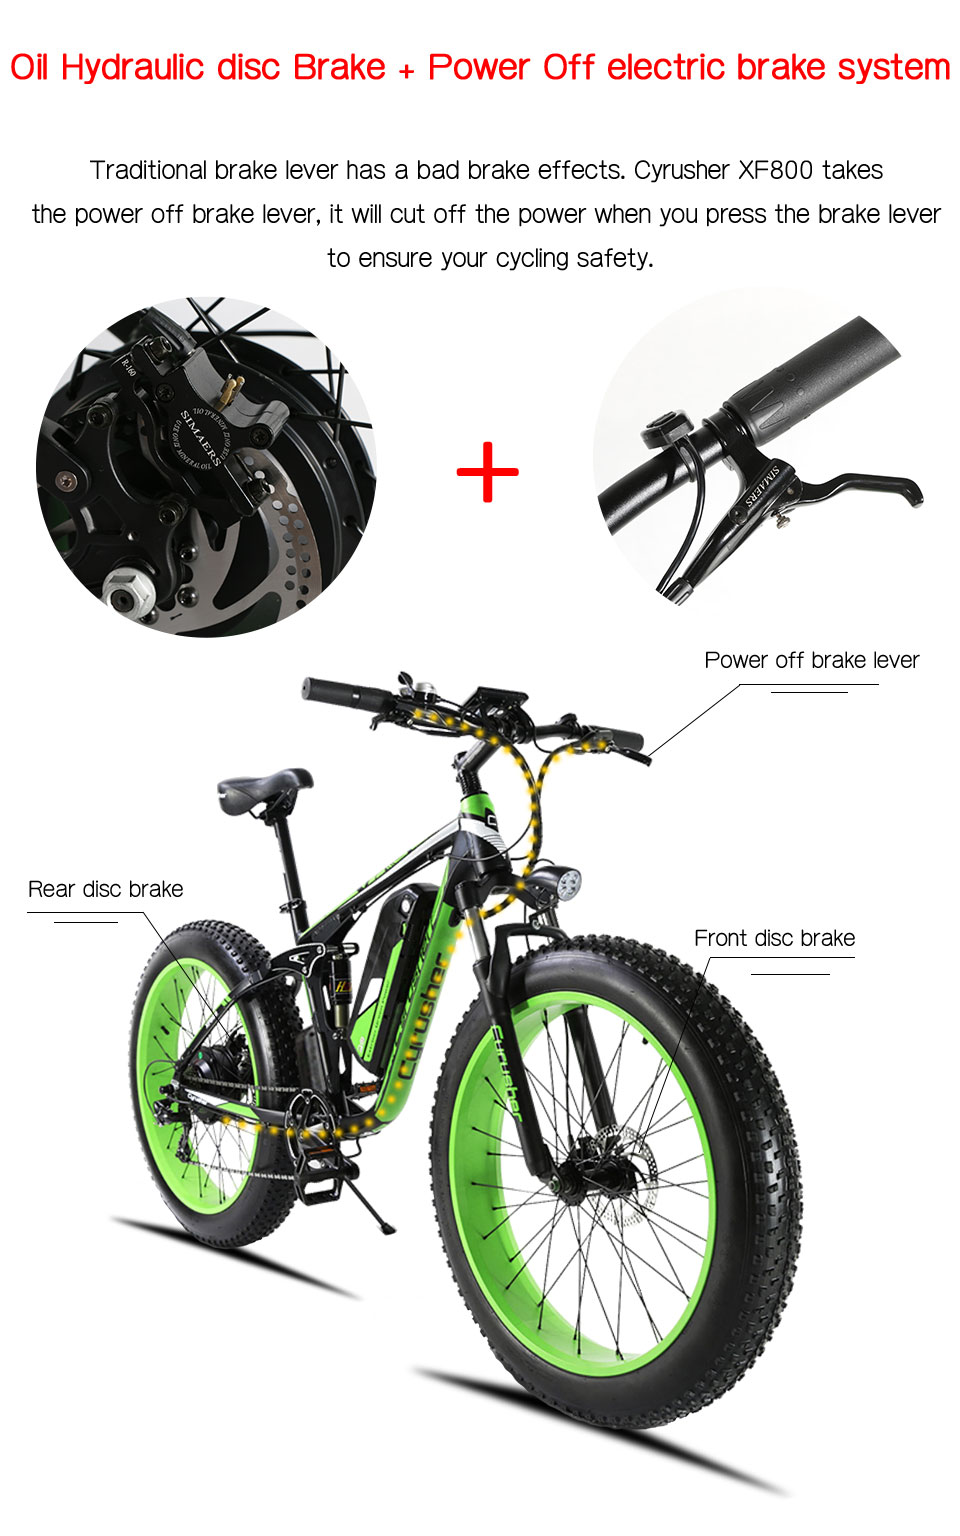 HTB1S7ZEMYrpK1RjSZTEq6AWAVXai - Cyrusher XF800 1000W 48V Electrical Bike Full Suspension body 7 Speeds widewheel highway Bike out of doors sensible speedometer Ebike